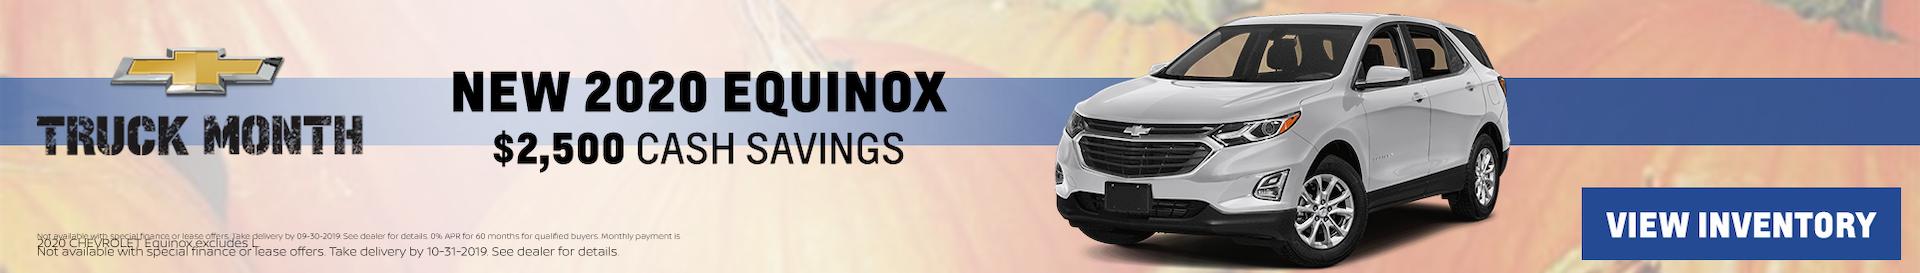 2019 Chevy Equinox October Special Offer